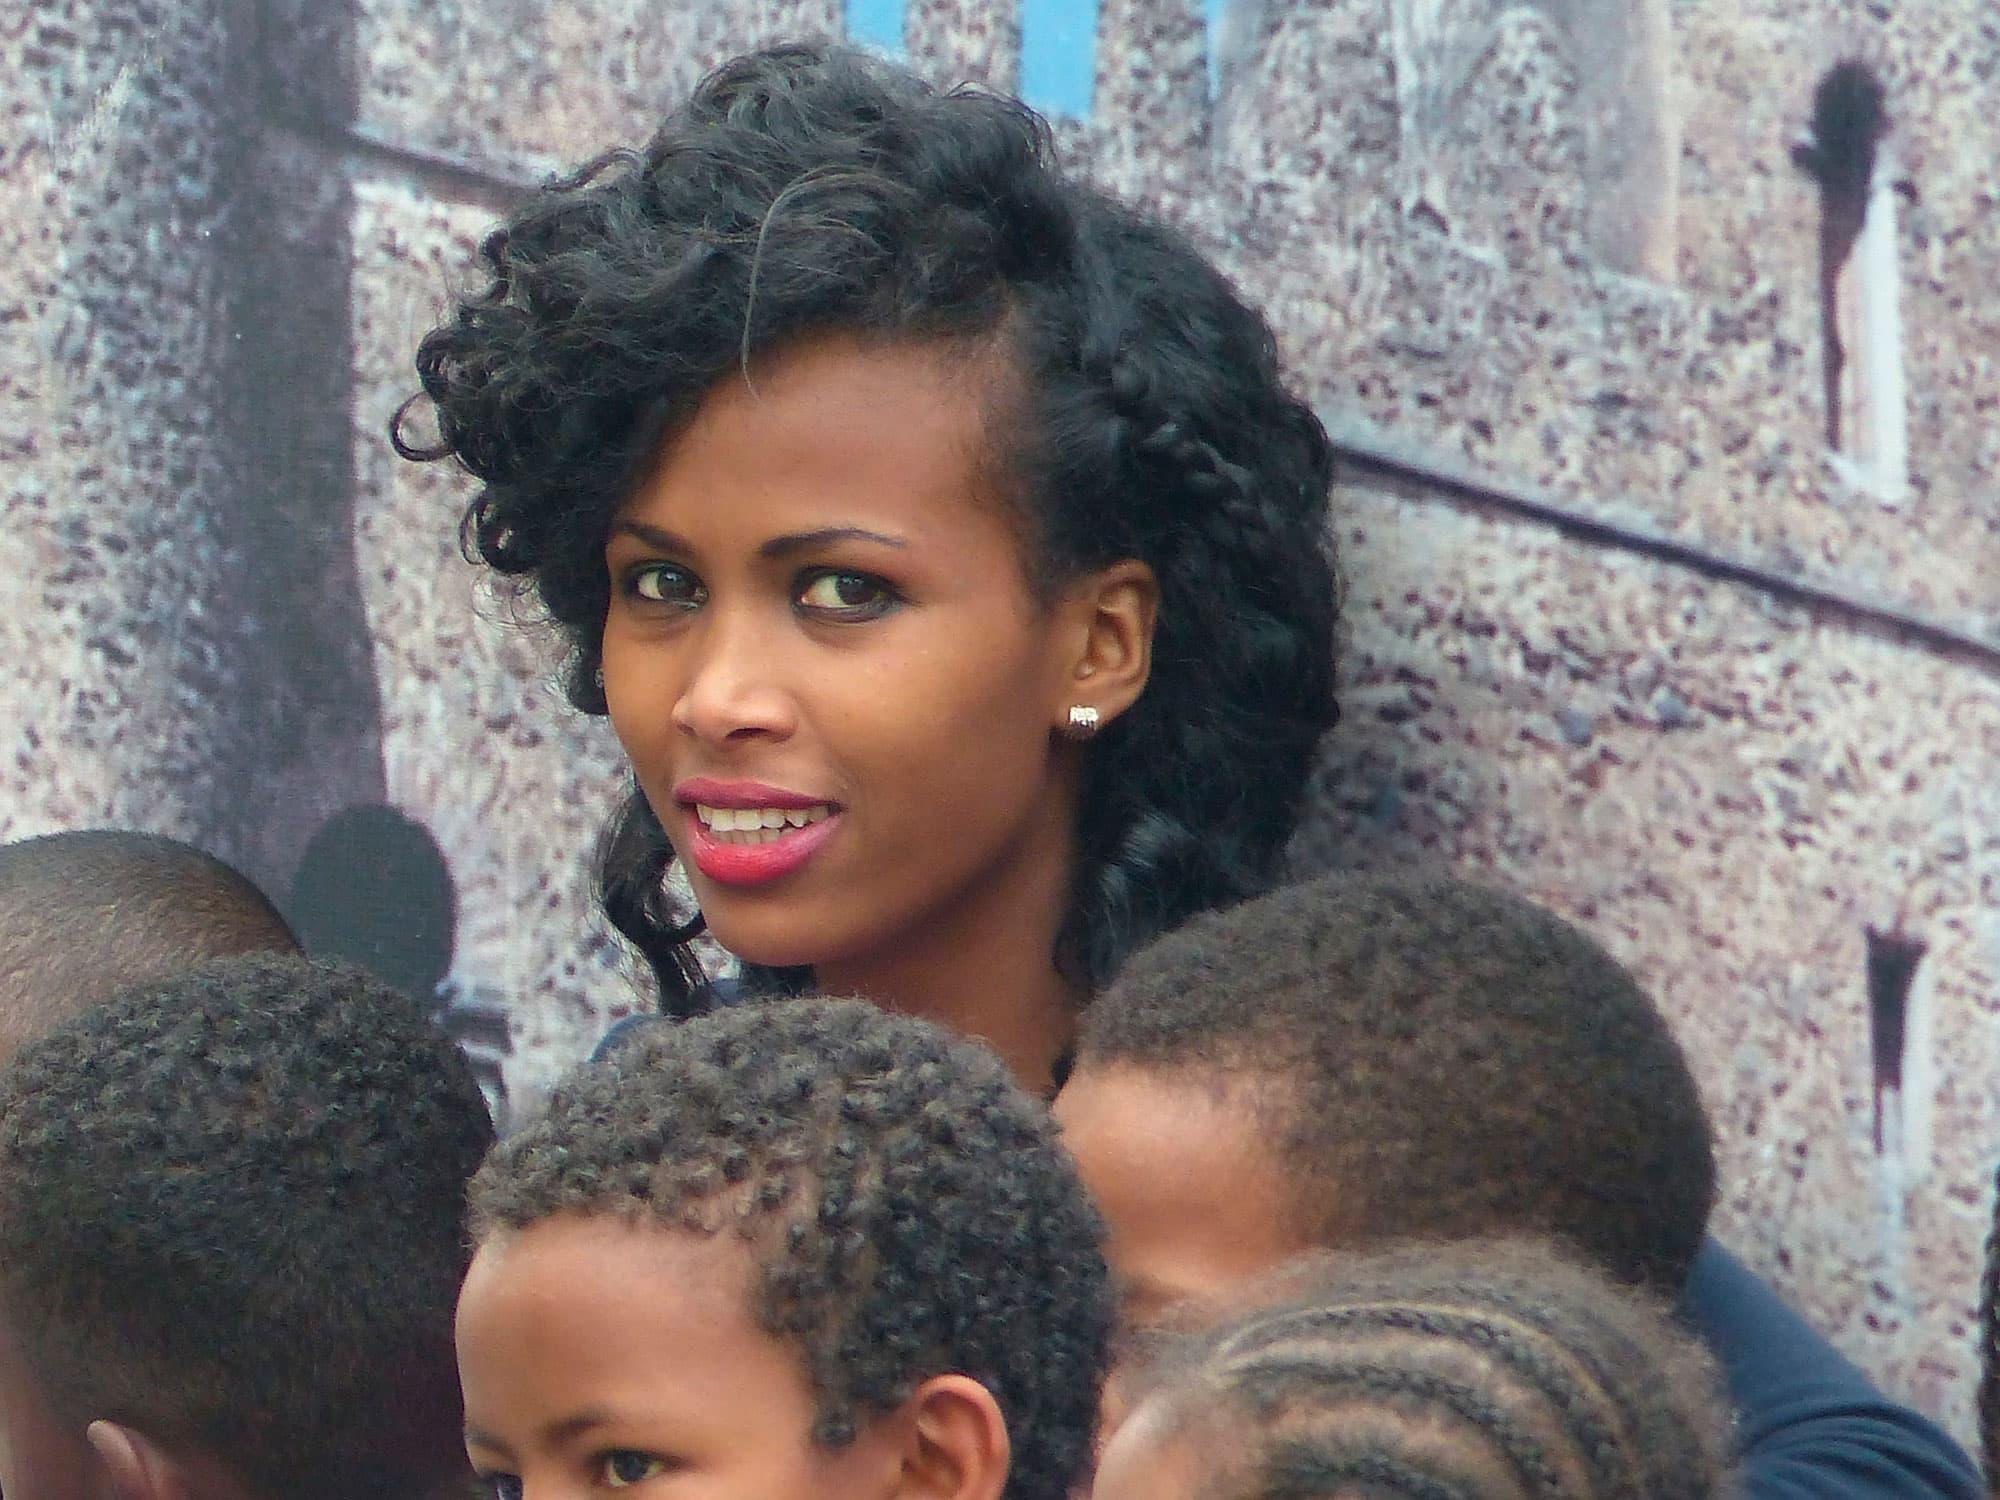 Norte de Etiopía - Etiopía- imagen #1